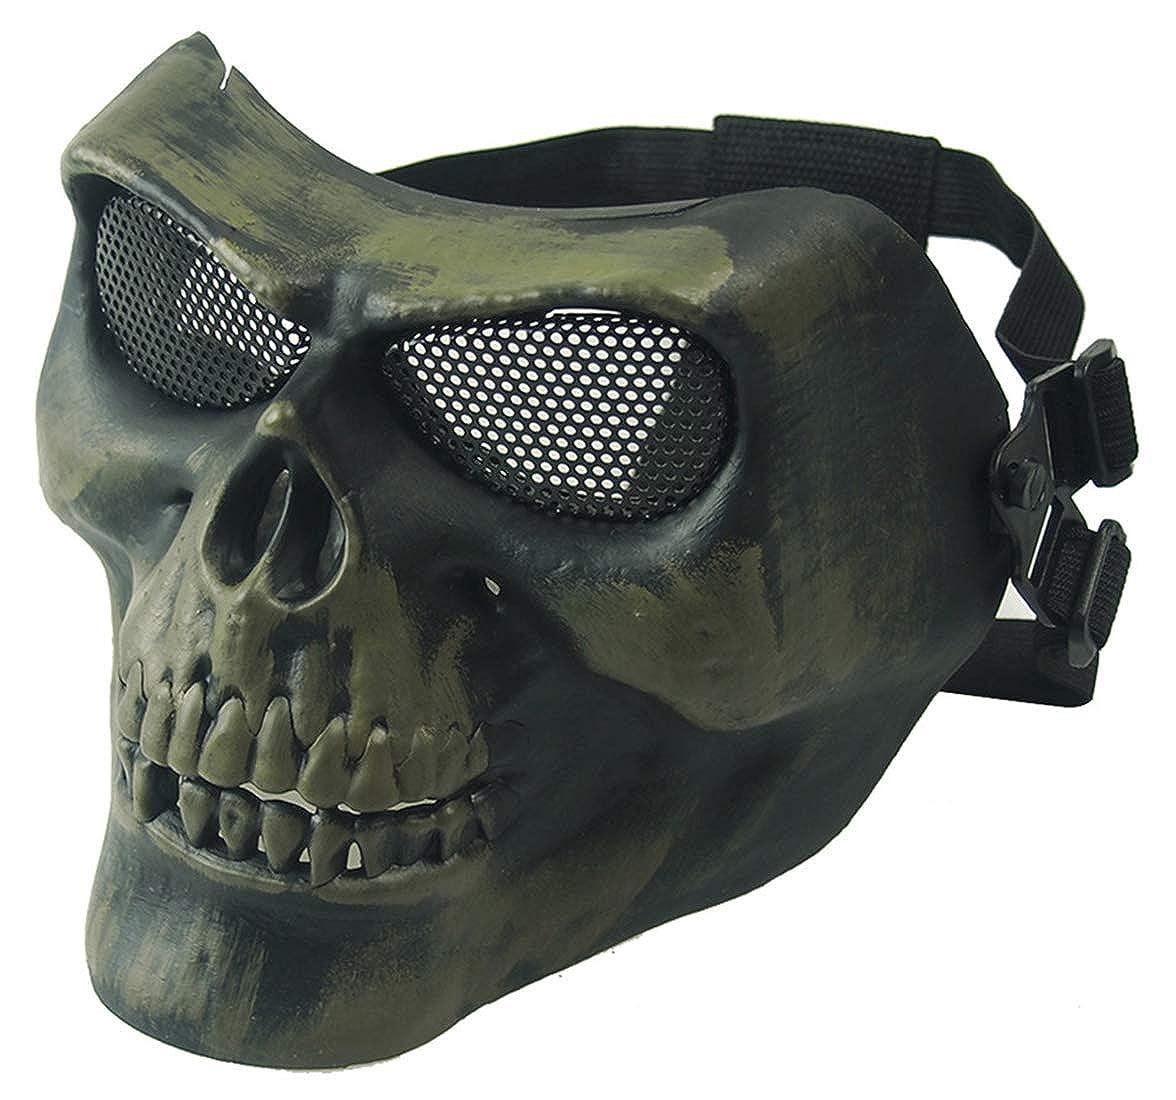 Panegy Costume Mask Skeleton Airsoft Adjustable Mask Halloween Costumes for Men HA01HNR0017